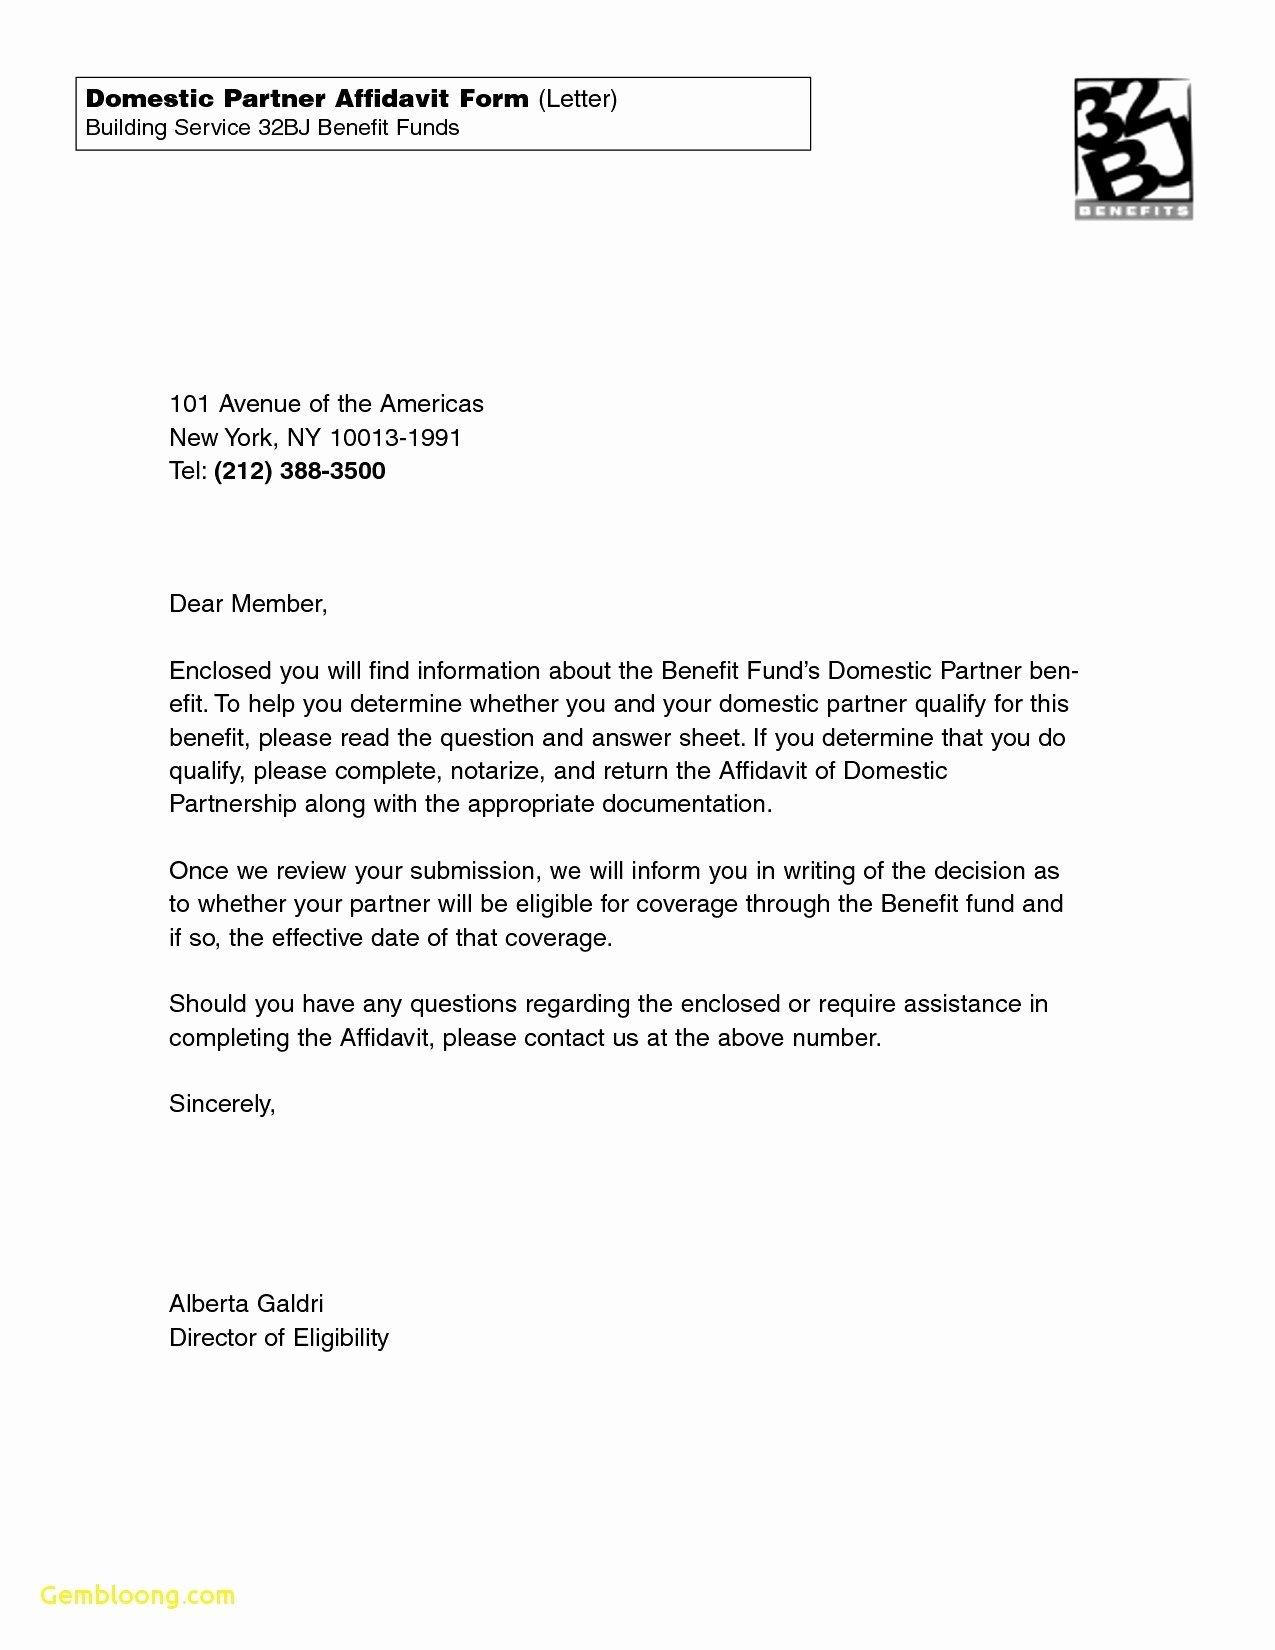 Letter Of Affidavit Of Support Best Of Affidavit Letter Template Marriage Sworn Sample Free for